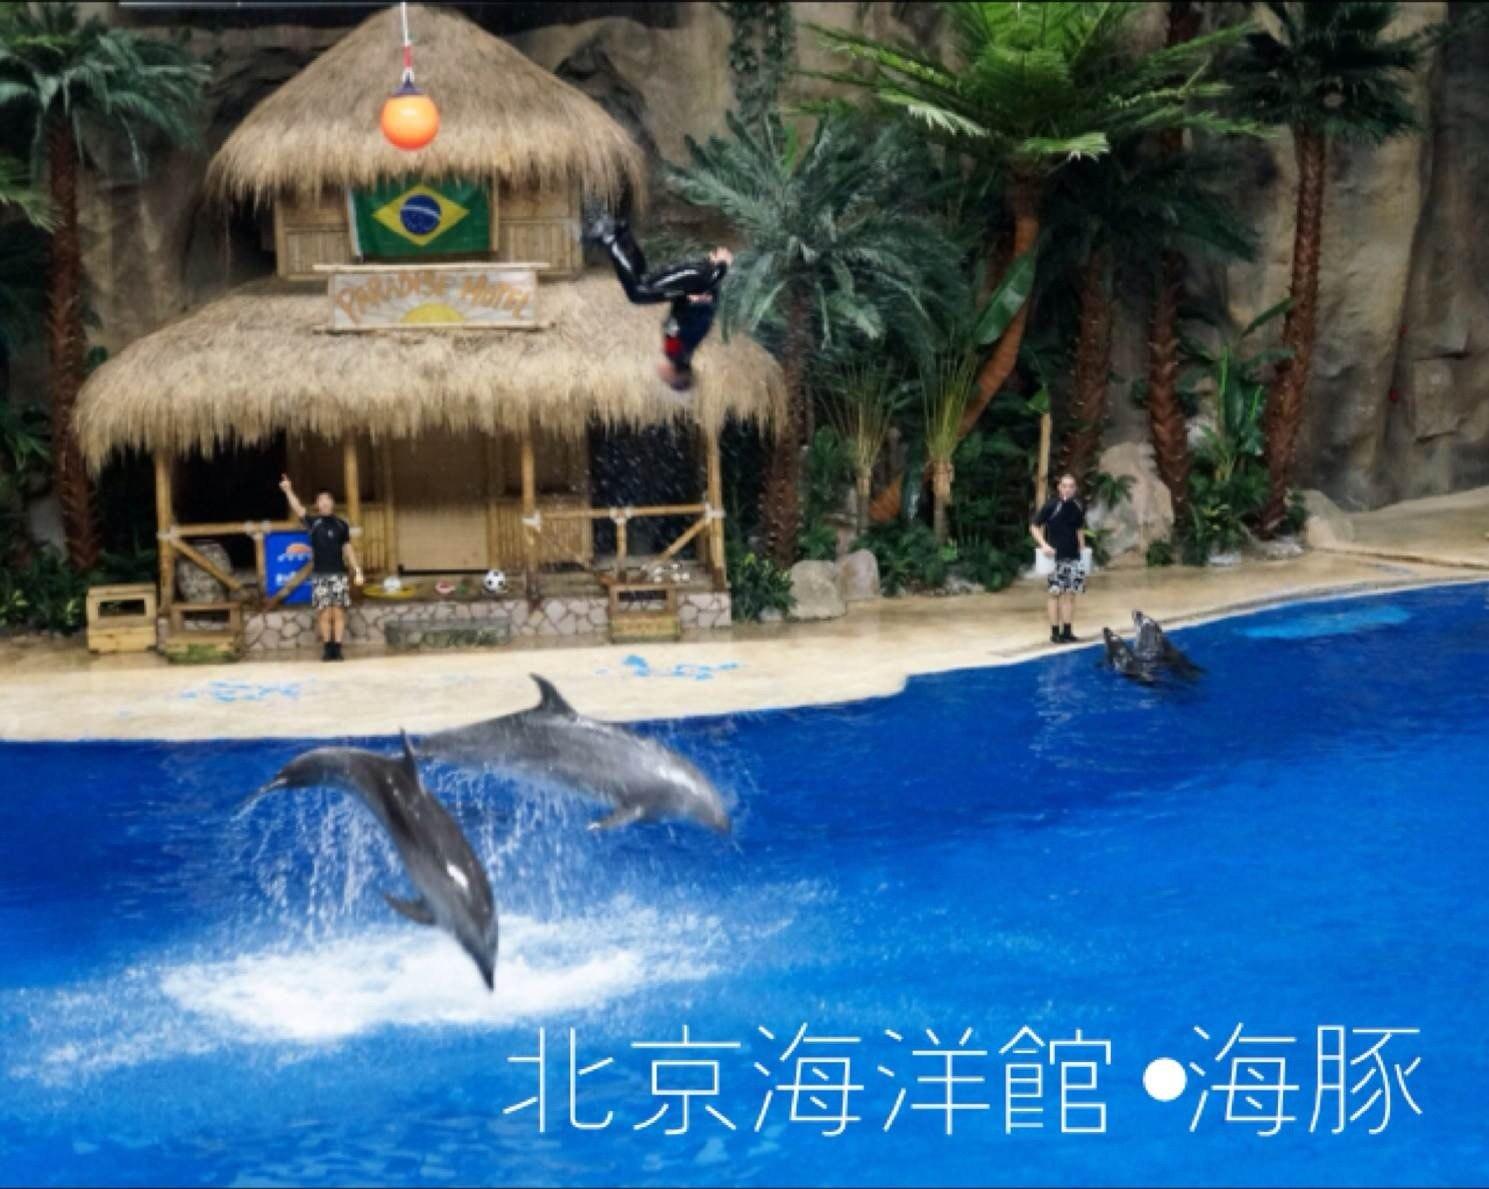 day4:北京动物园,北京海洋馆